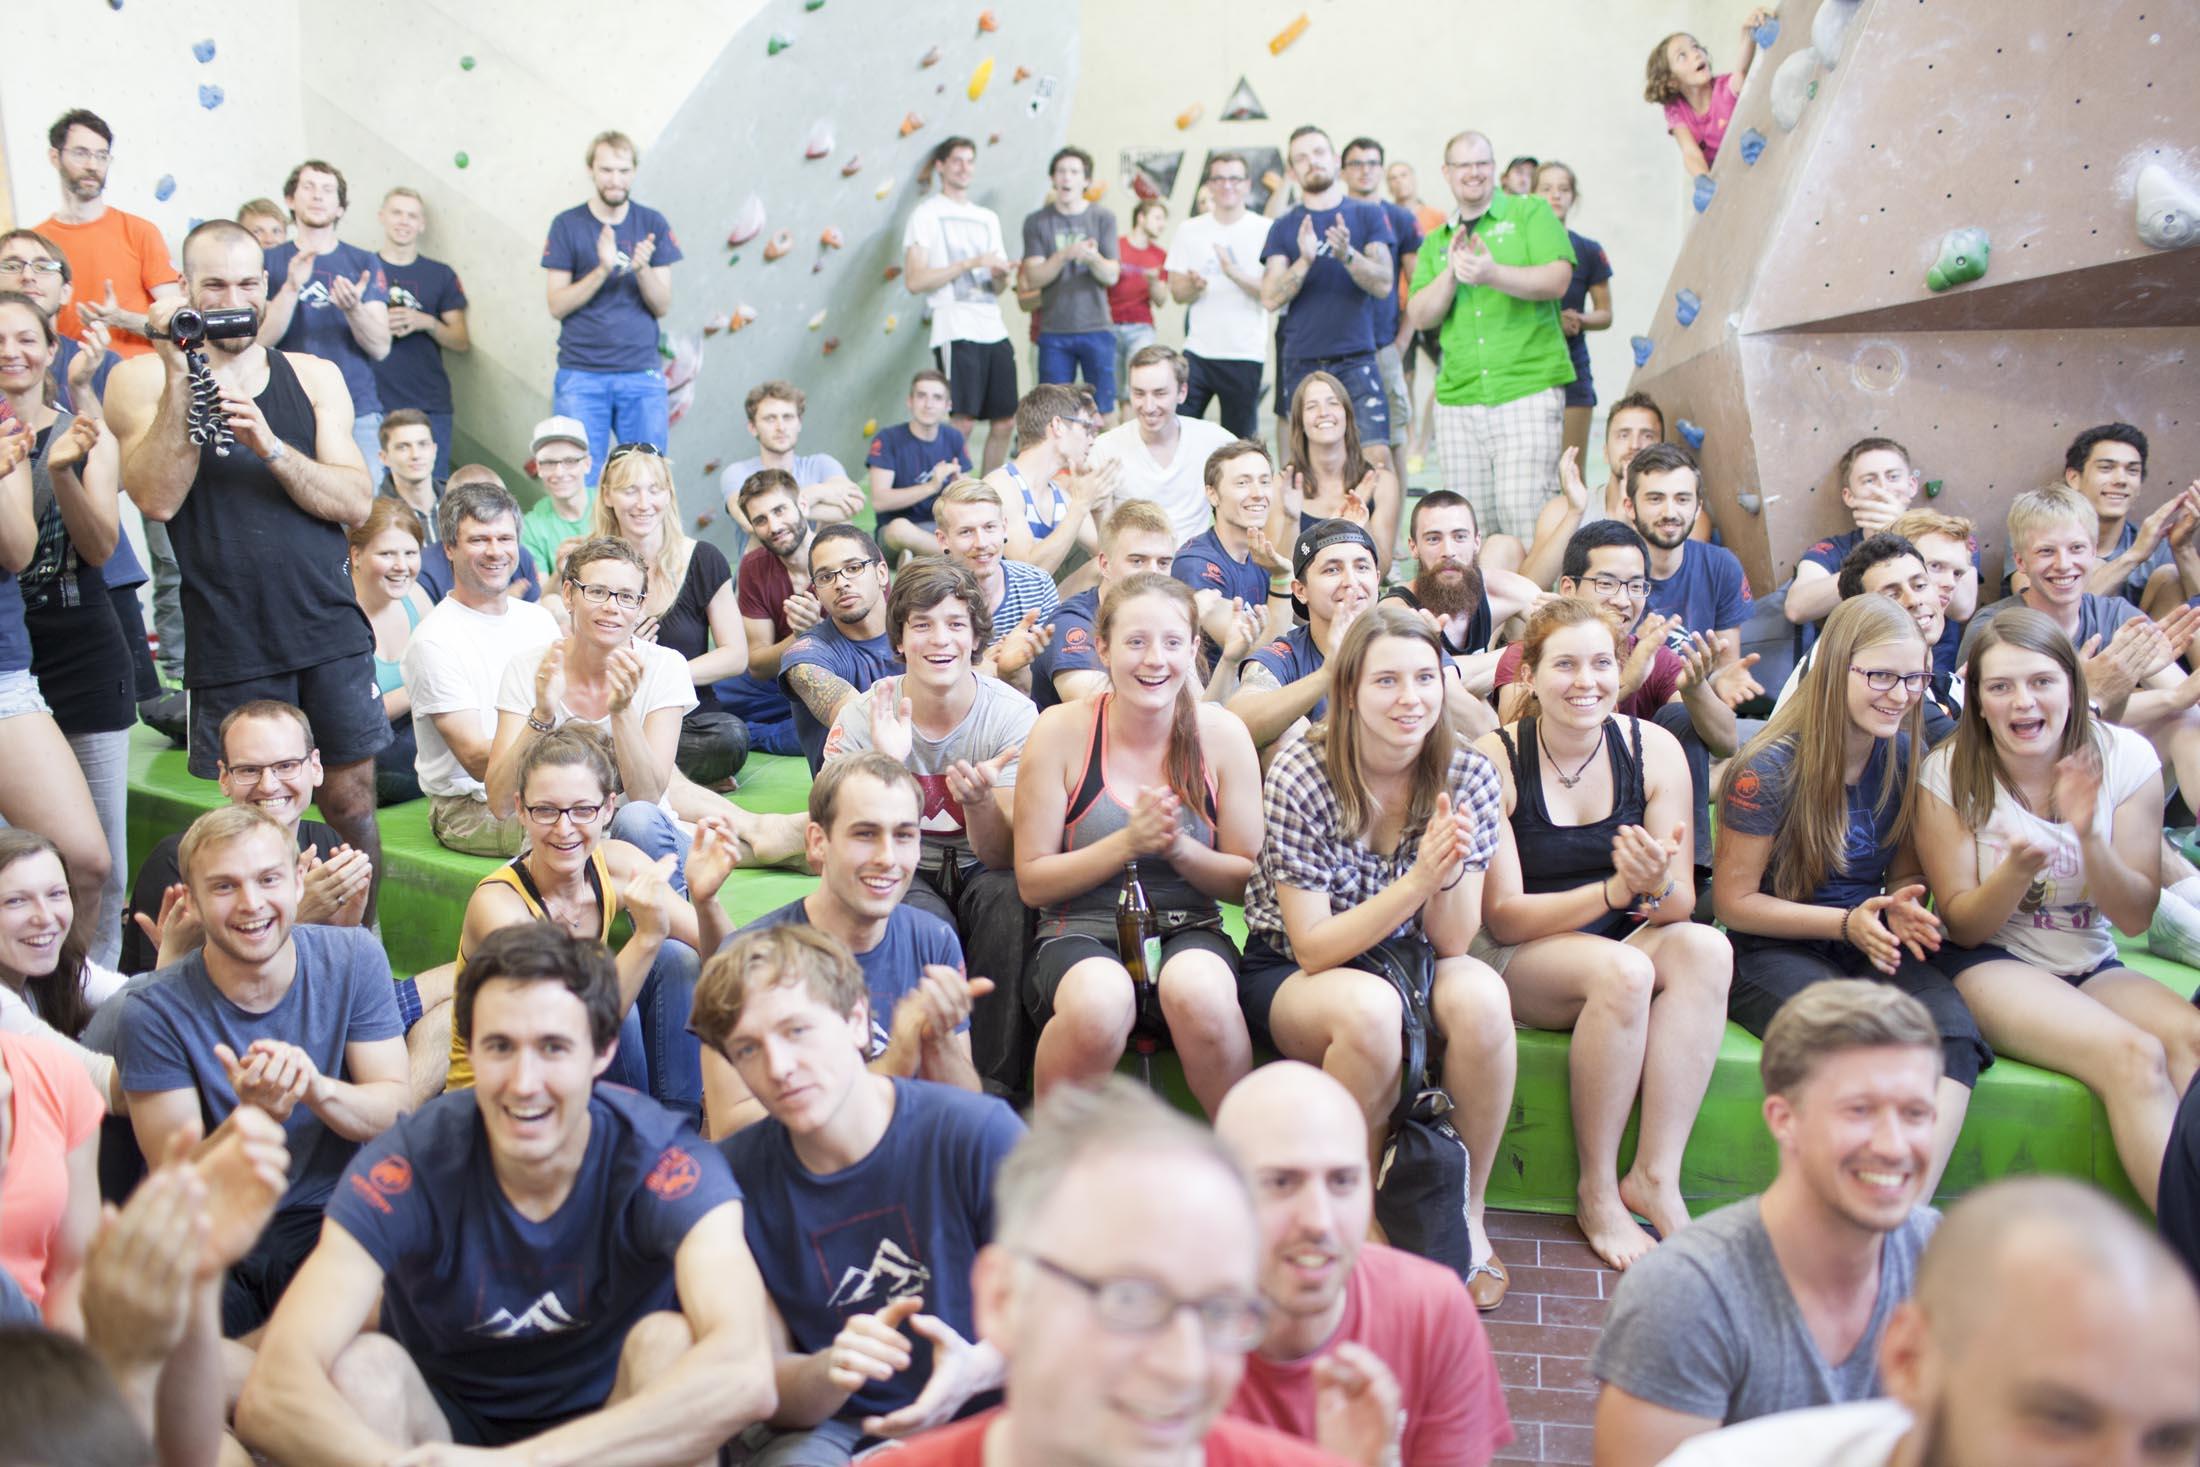 Finale, internationaler bouldercup Frankenjura 2016, BLOCKHELDEN Erlangen, Mammut, Bergfreunde.de, Boulderwettkampf07092016593